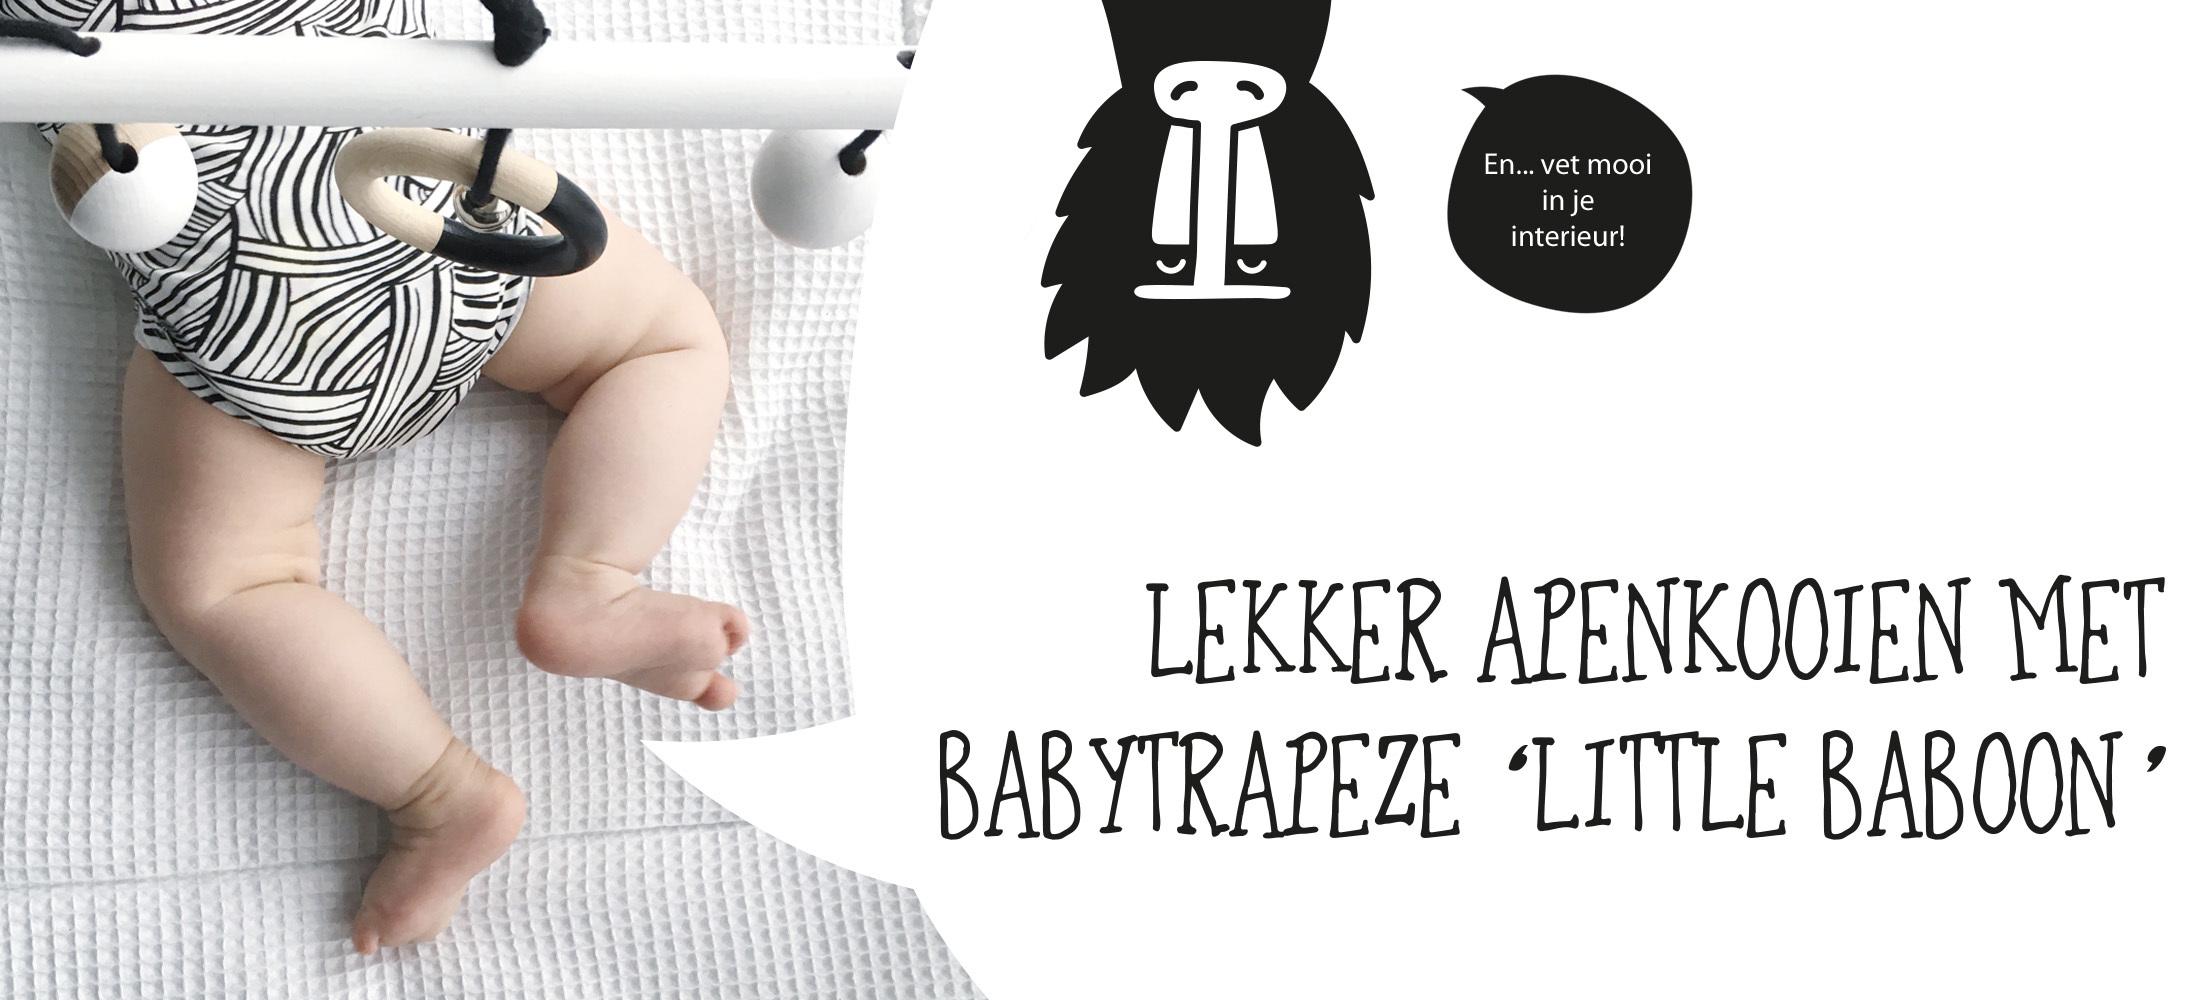 babytrapeze_DAX